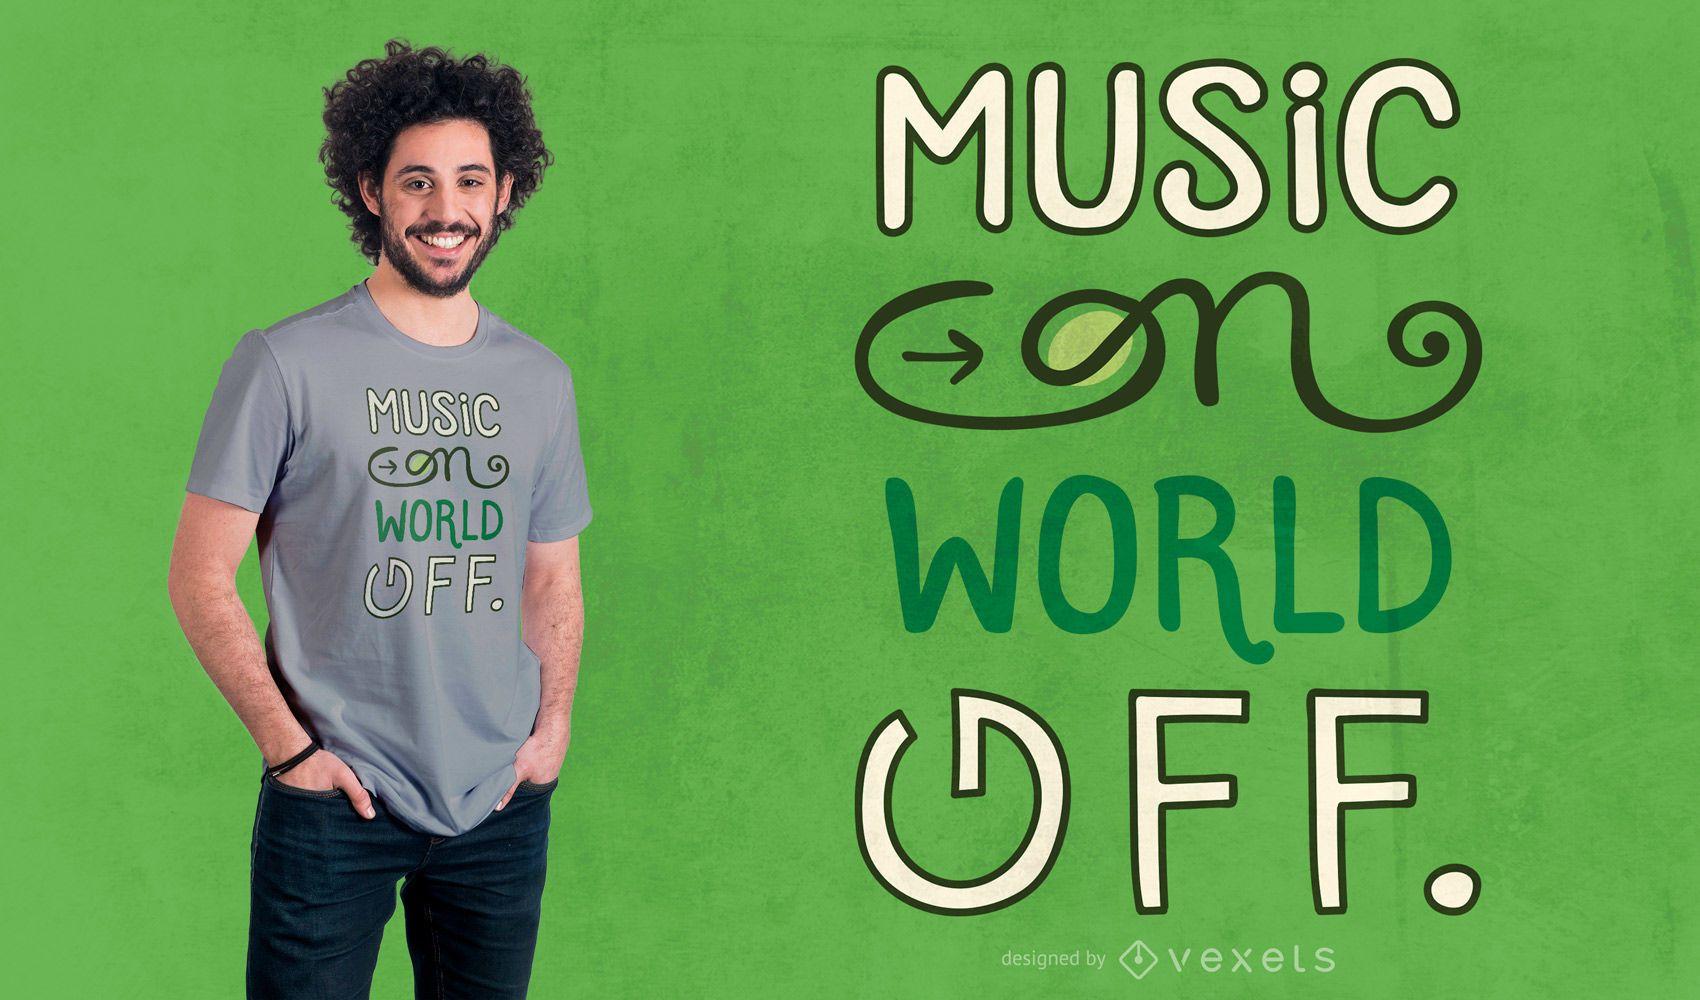 Music on t-shirt design